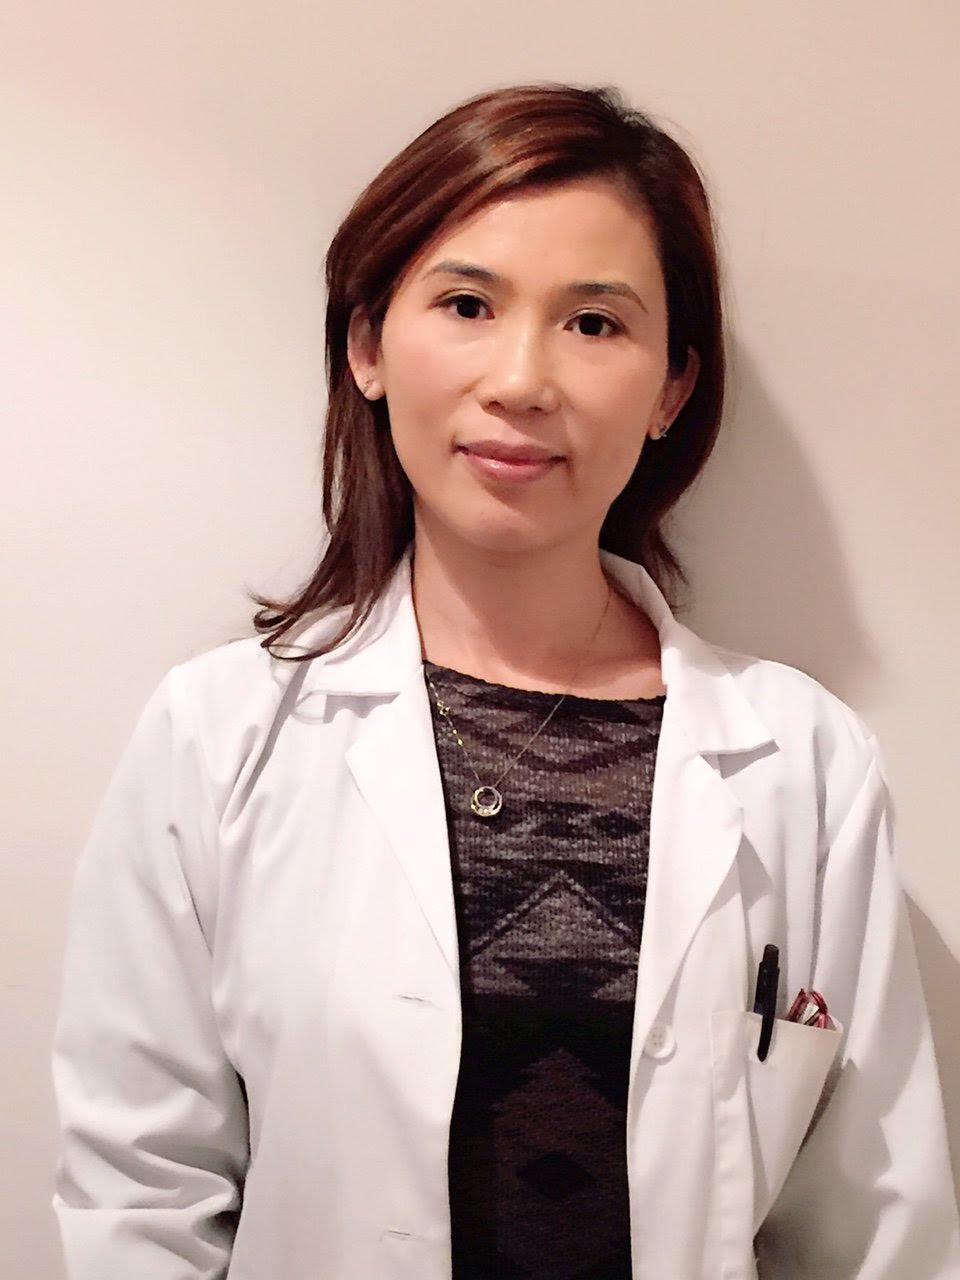 Jasmine Hong Lai